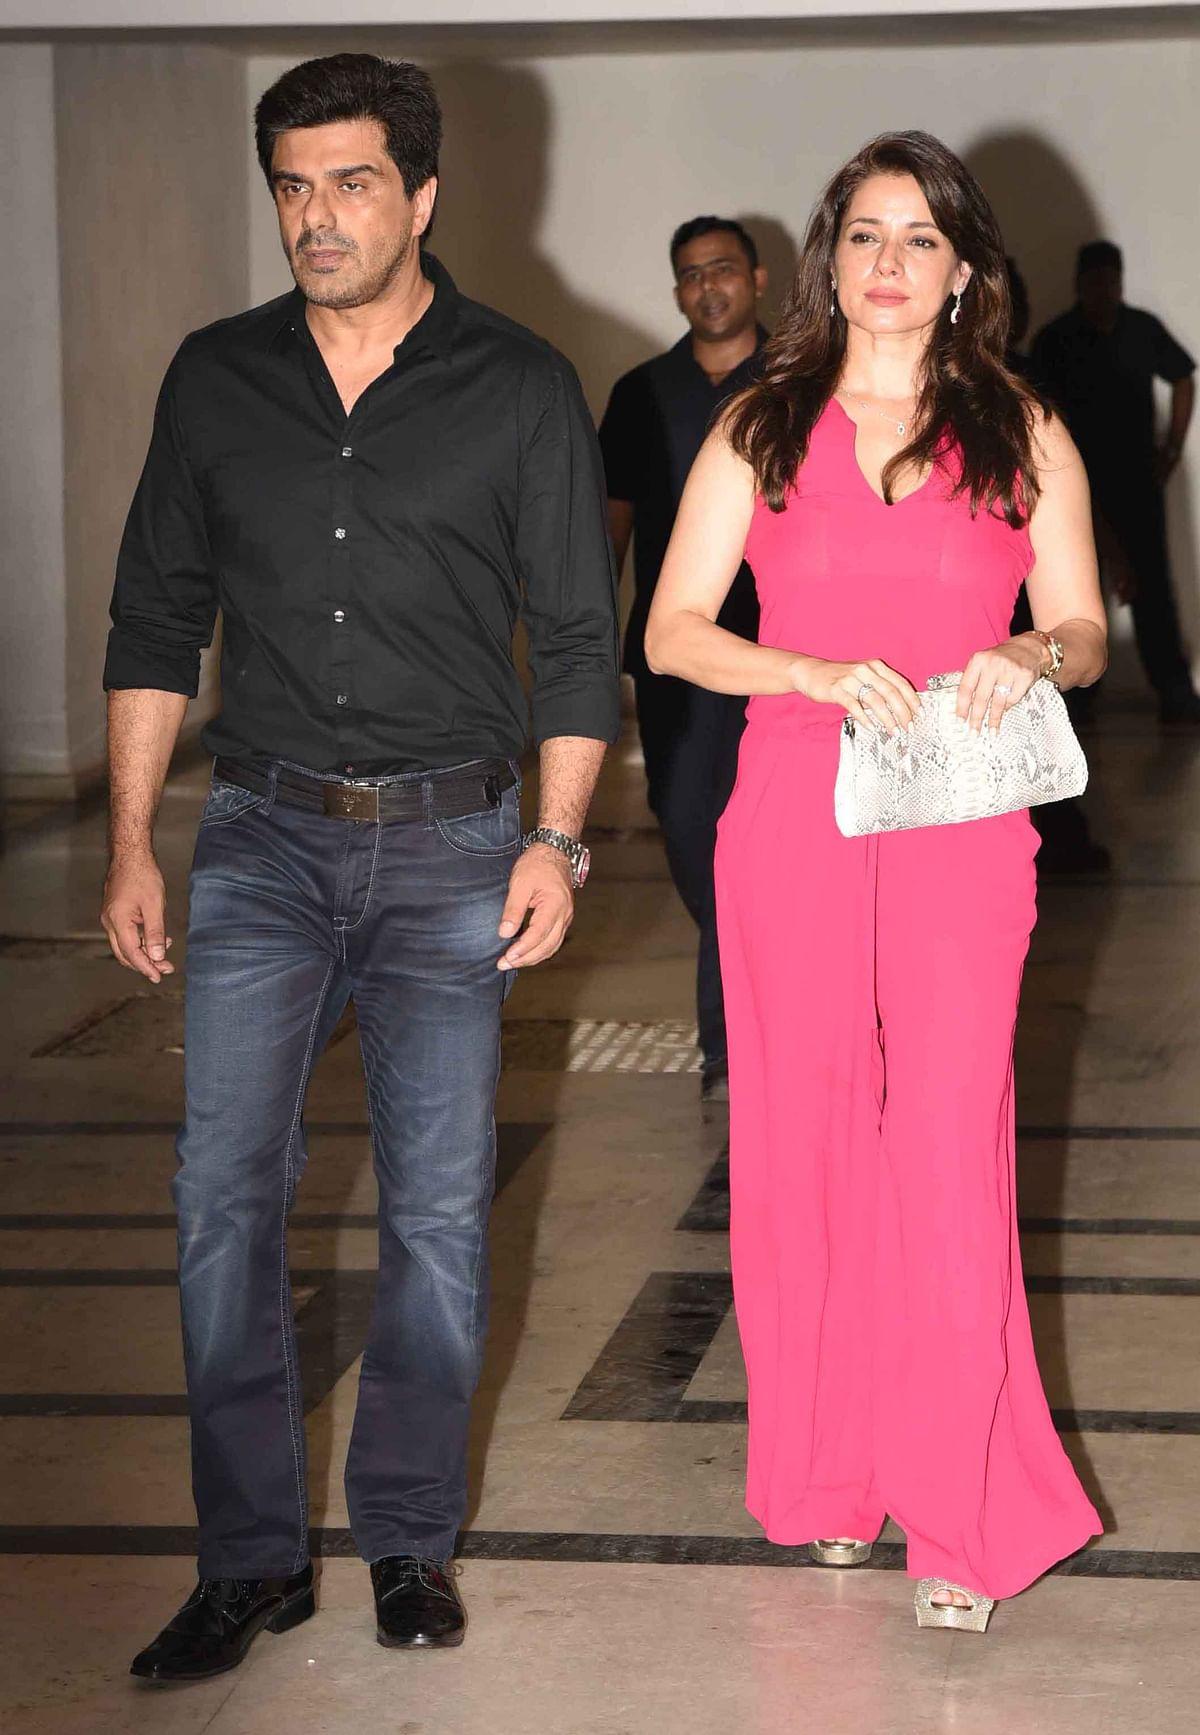 Samir Soni walks in with wife Neelam. (Photo: Yogen Shah)